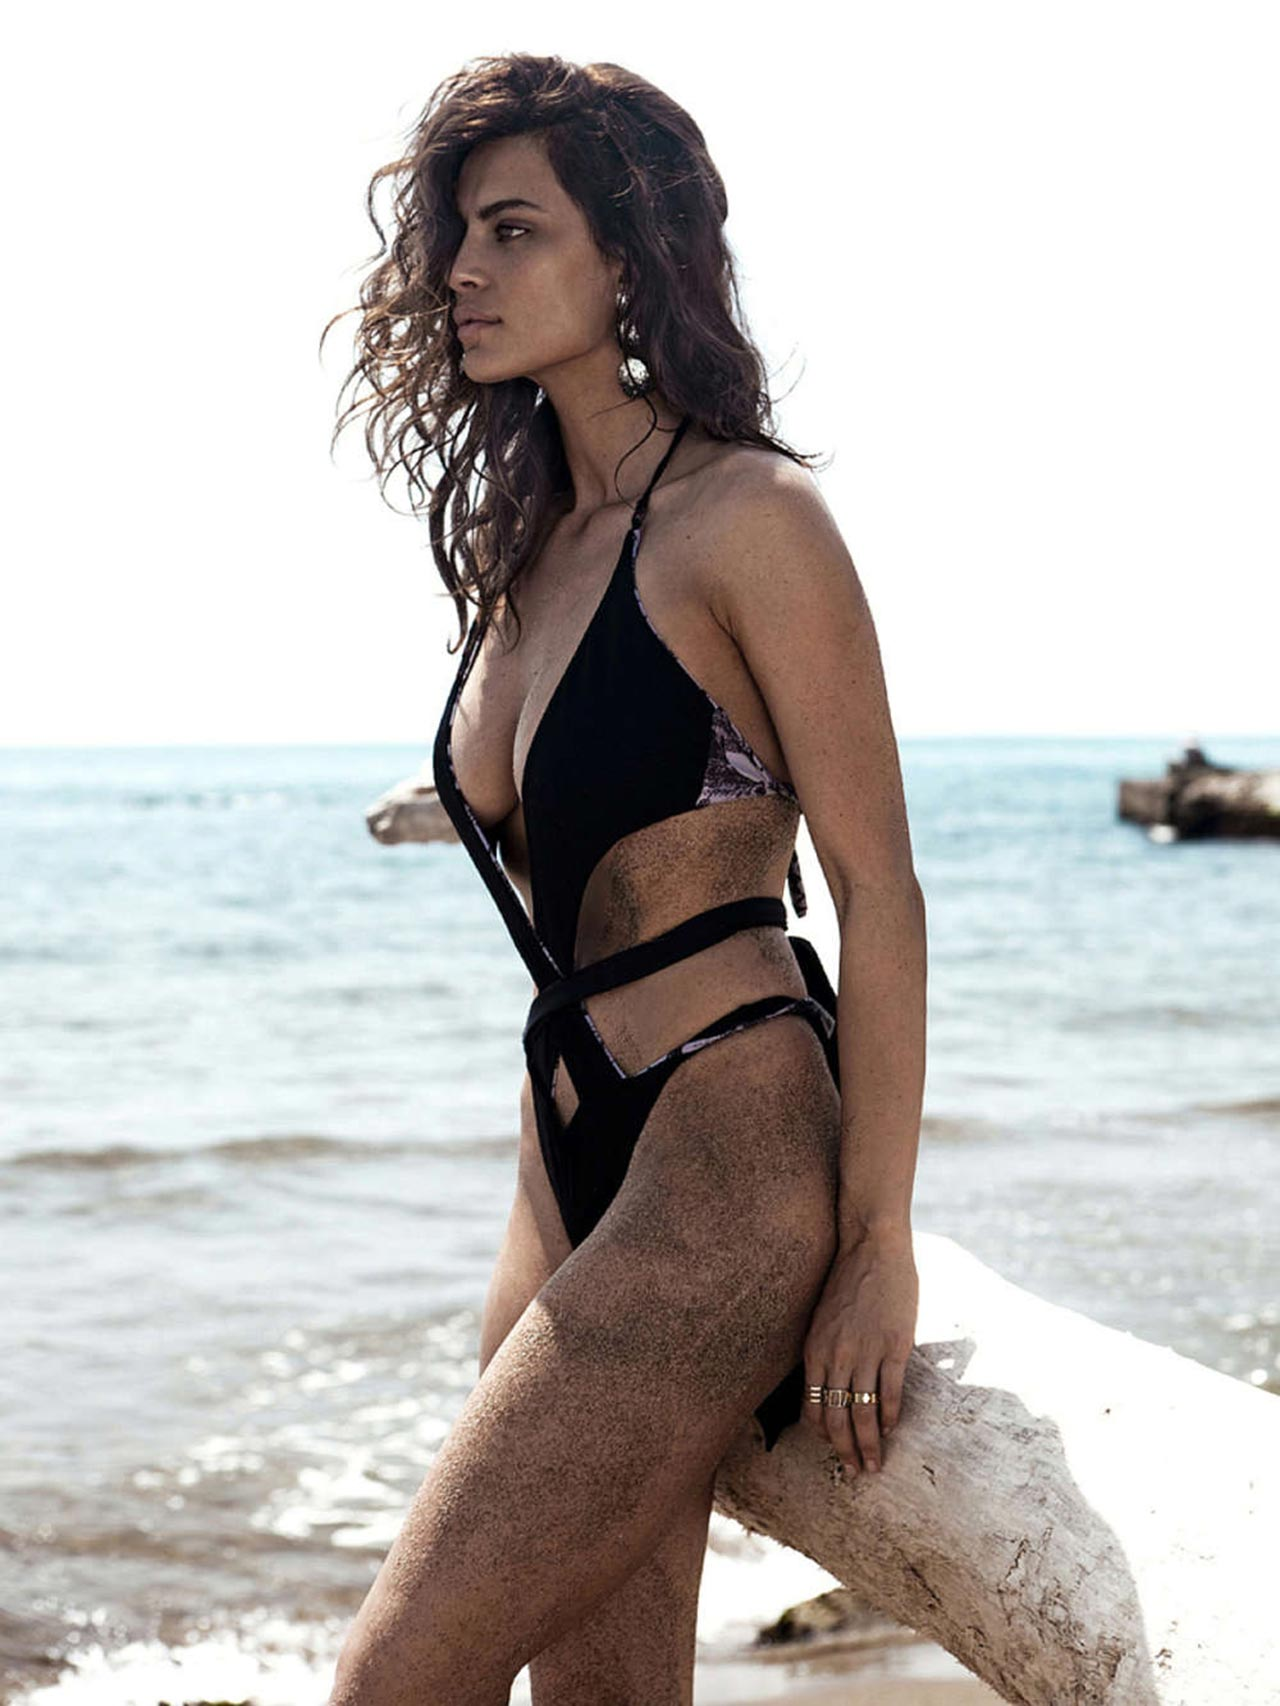 Catrinel Menghia Bikini Photoshoot The One Magazine June